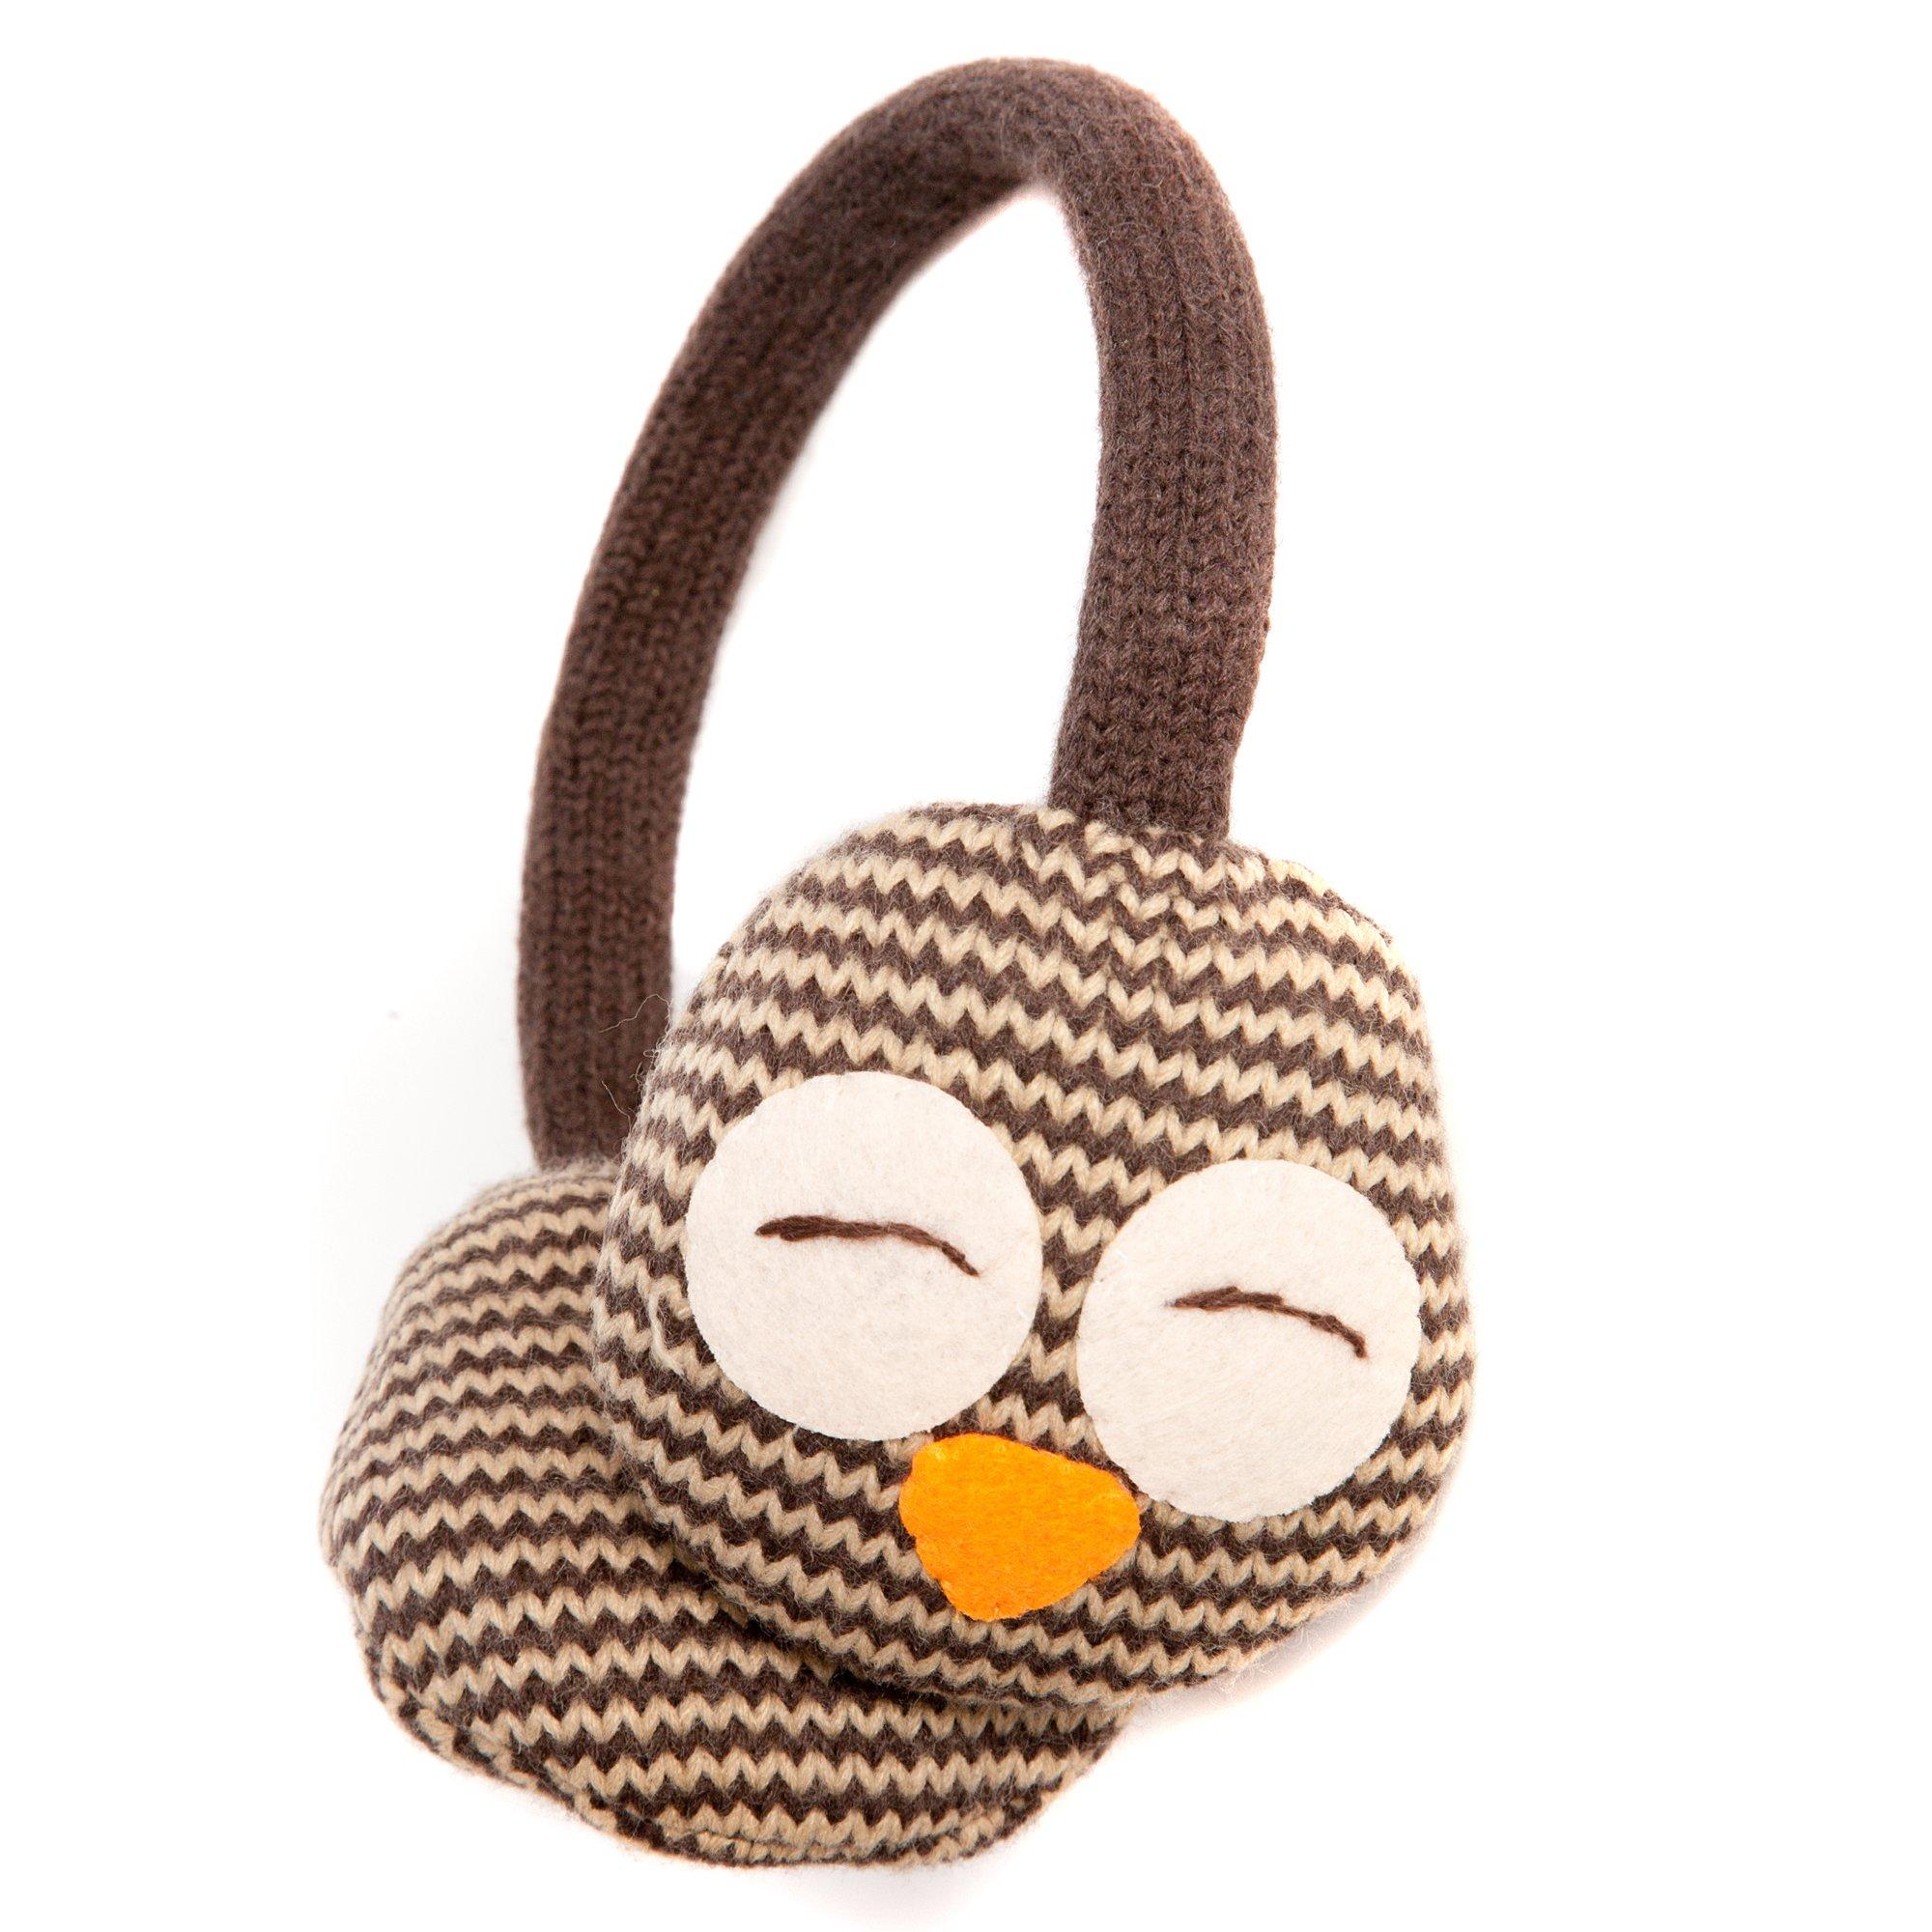 Accessoryo Women's Cute Sleepy Owl Style Earmuffs One Size Brown and Beige